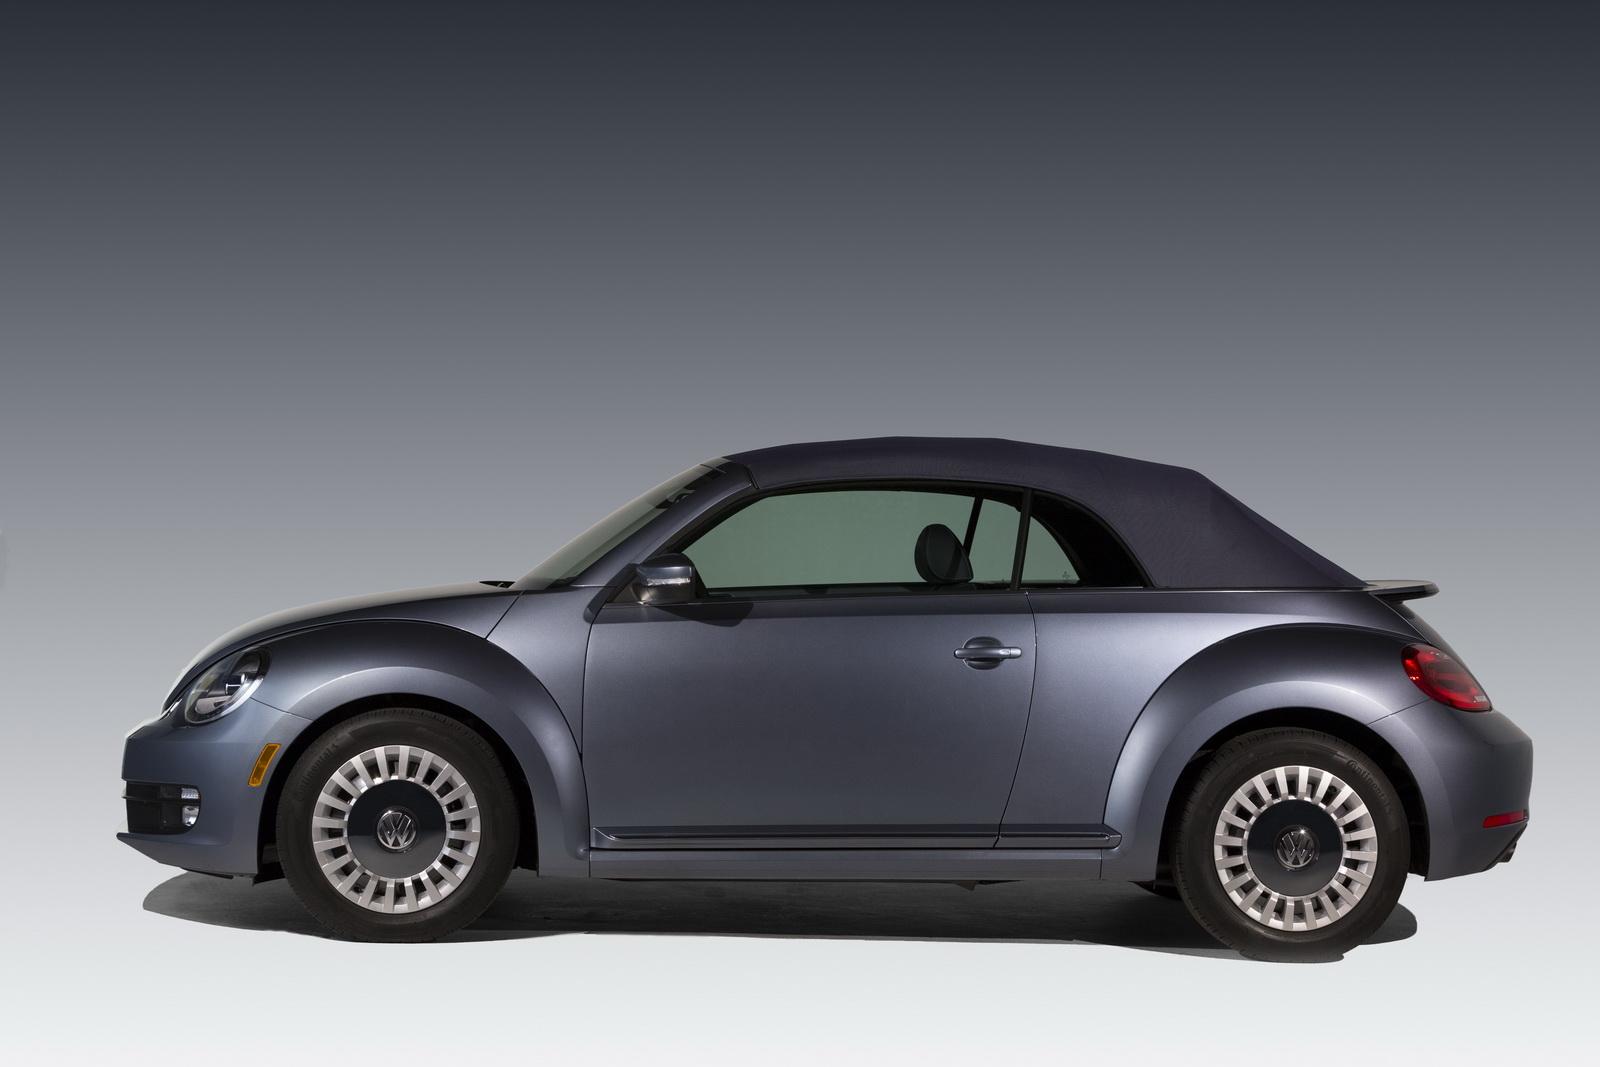 2016 volkswagen beetle convertible denim edition image 456280. Black Bedroom Furniture Sets. Home Design Ideas